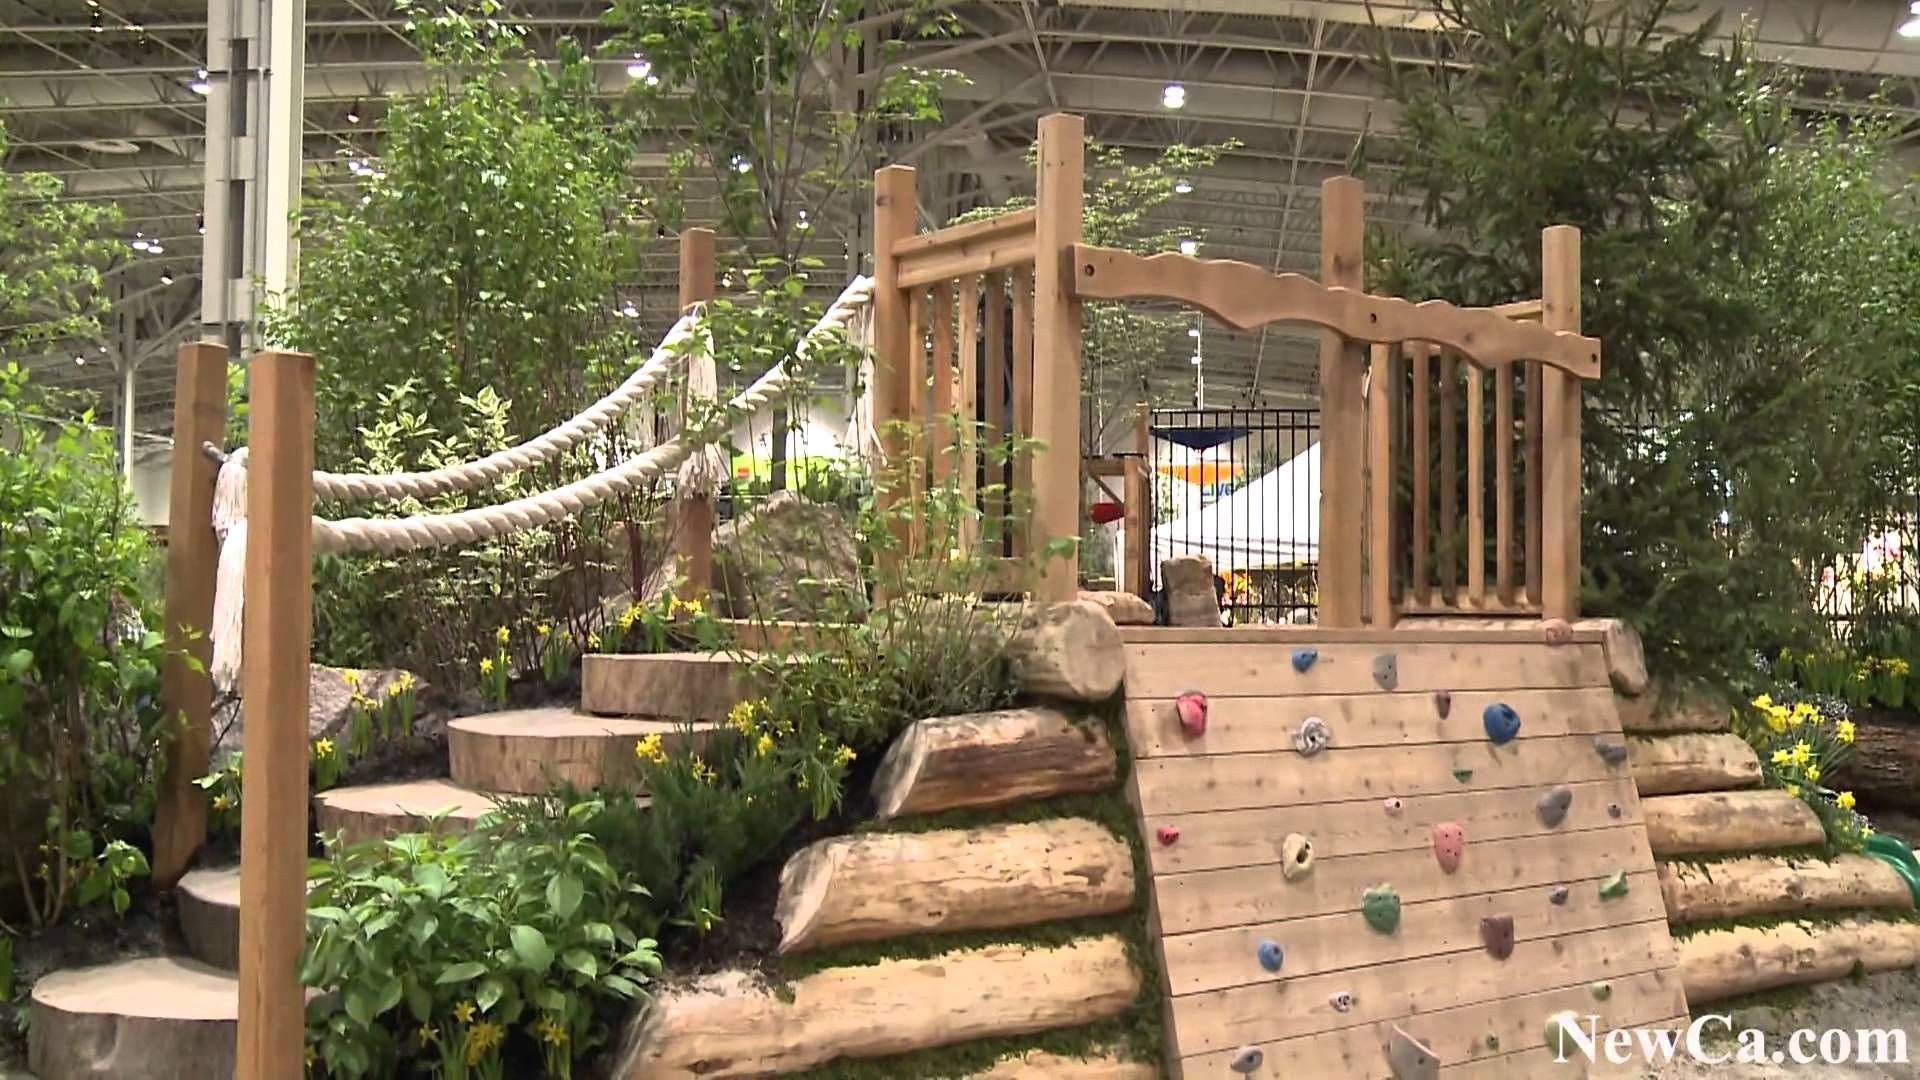 natural play | Natural playground, Preschool playground ...